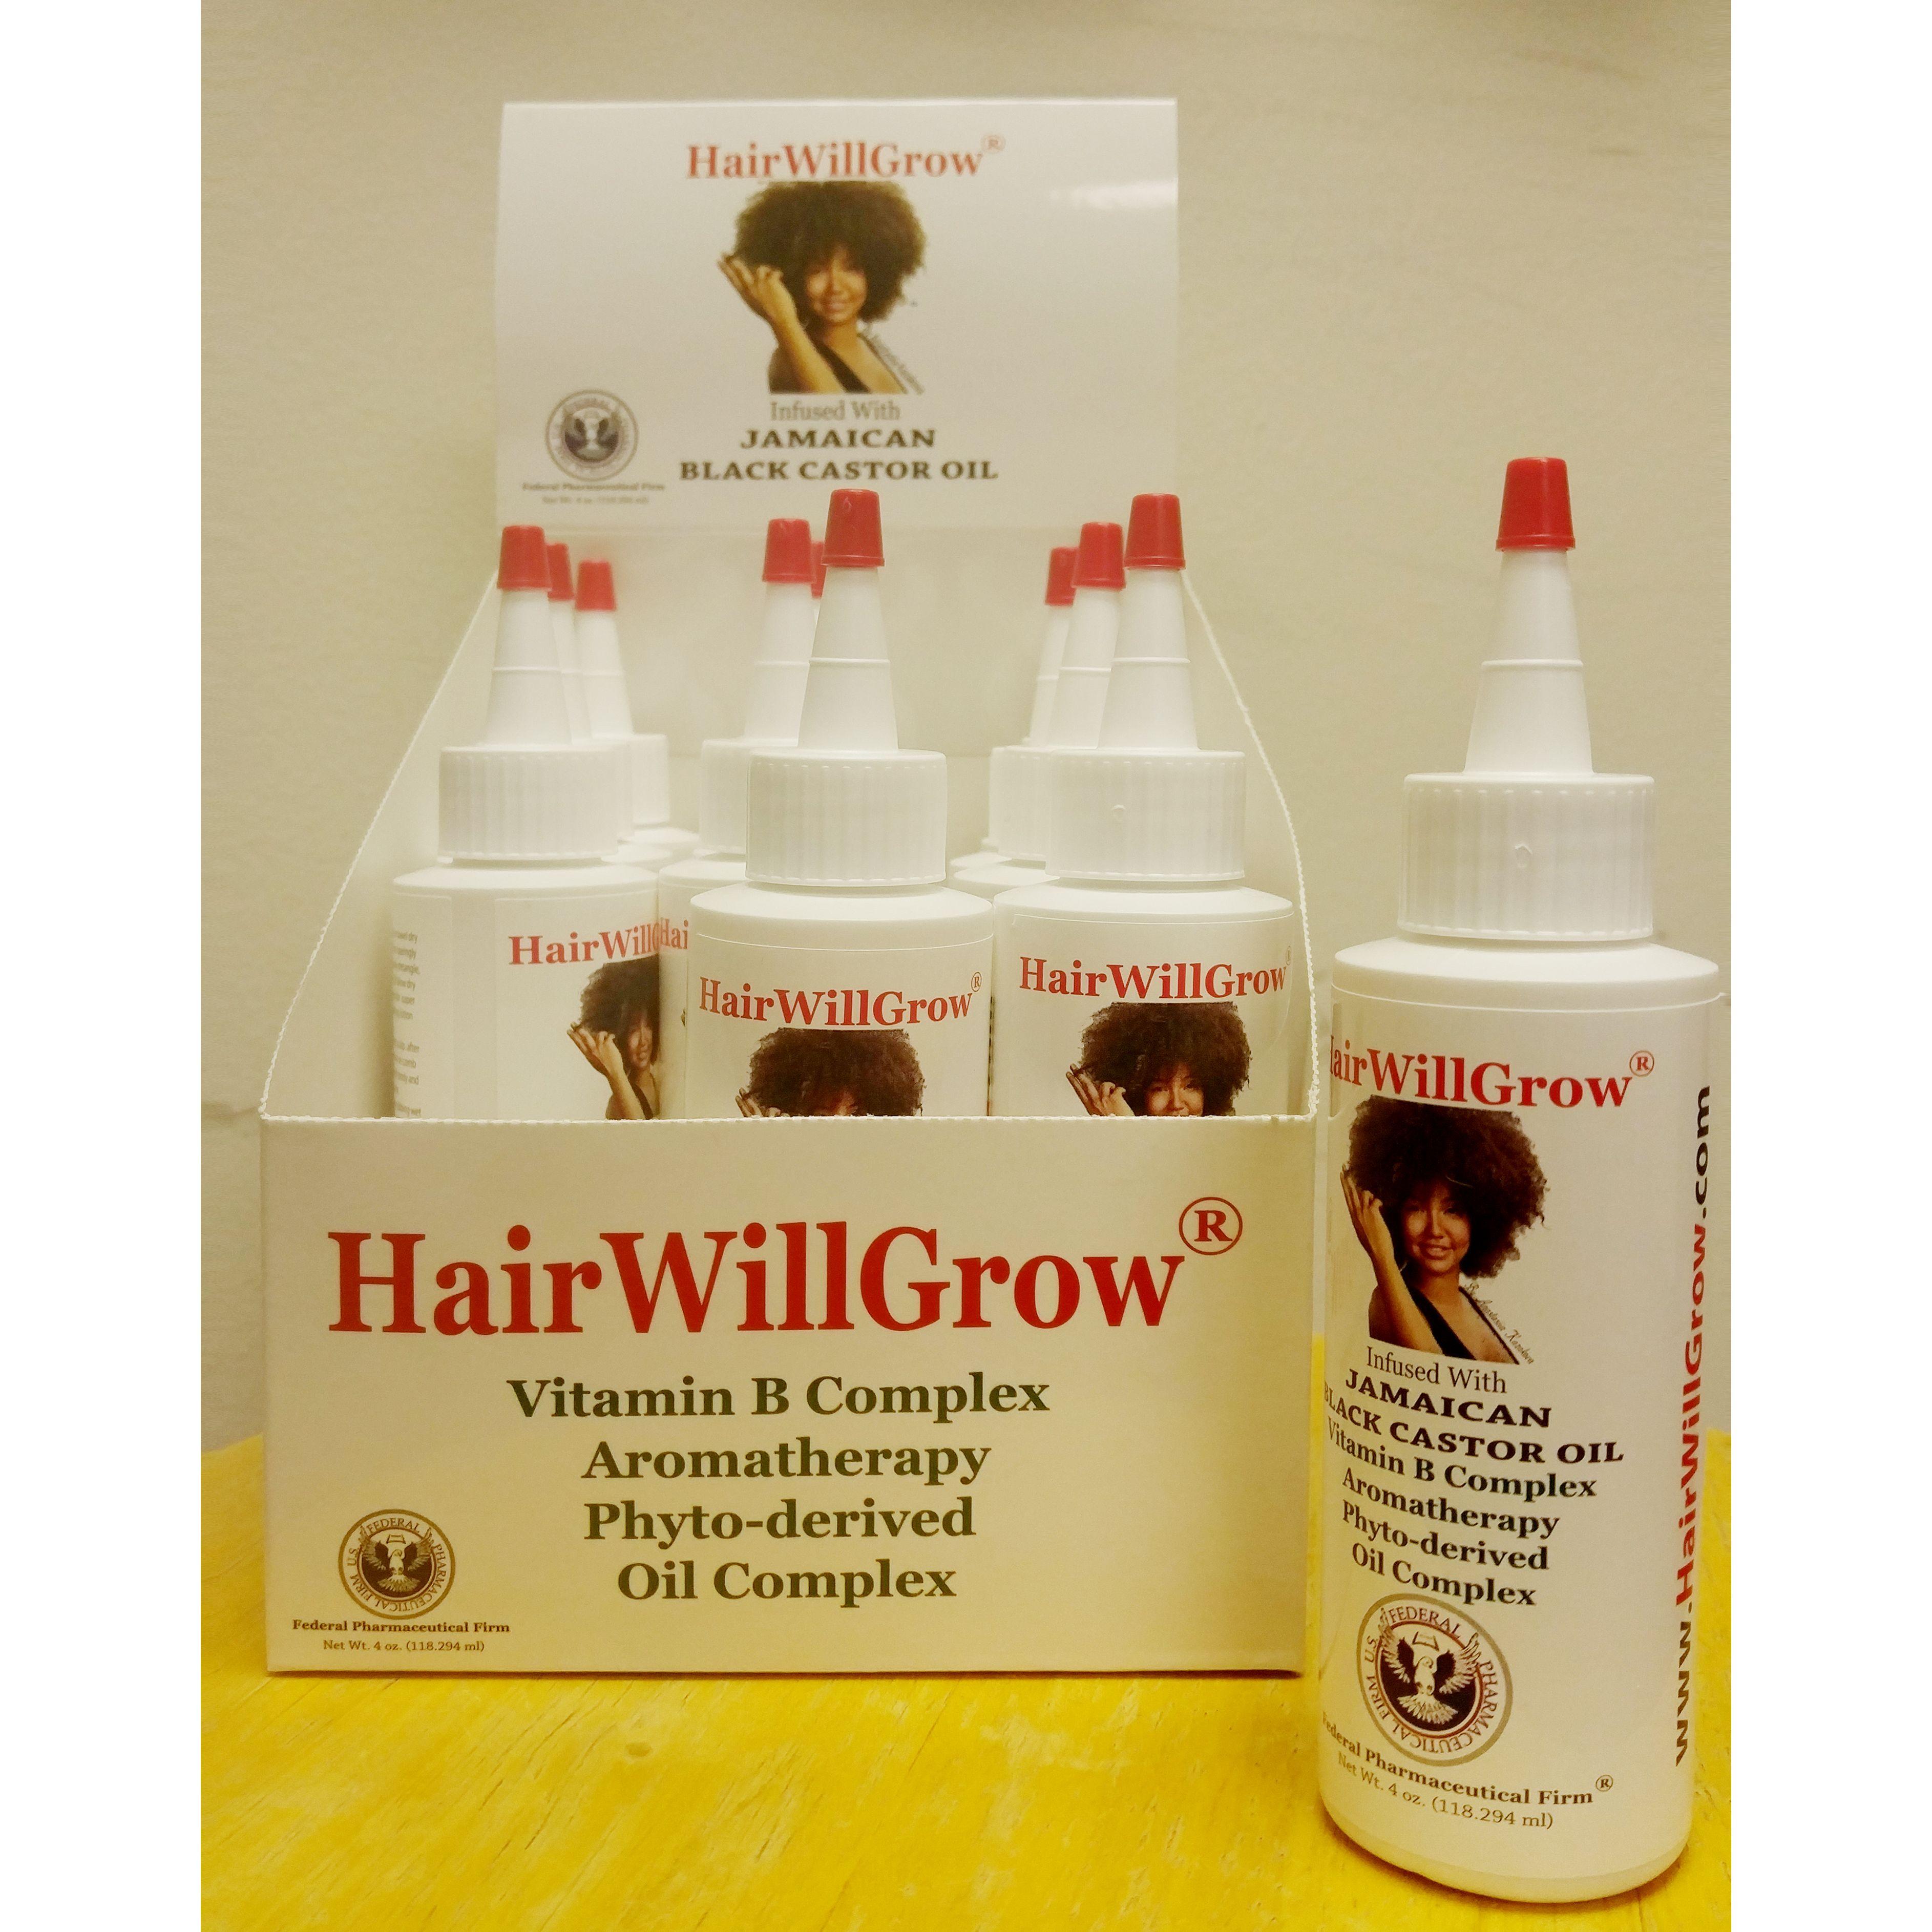 Jamaican black castor oil infused with jamaican black castor oil